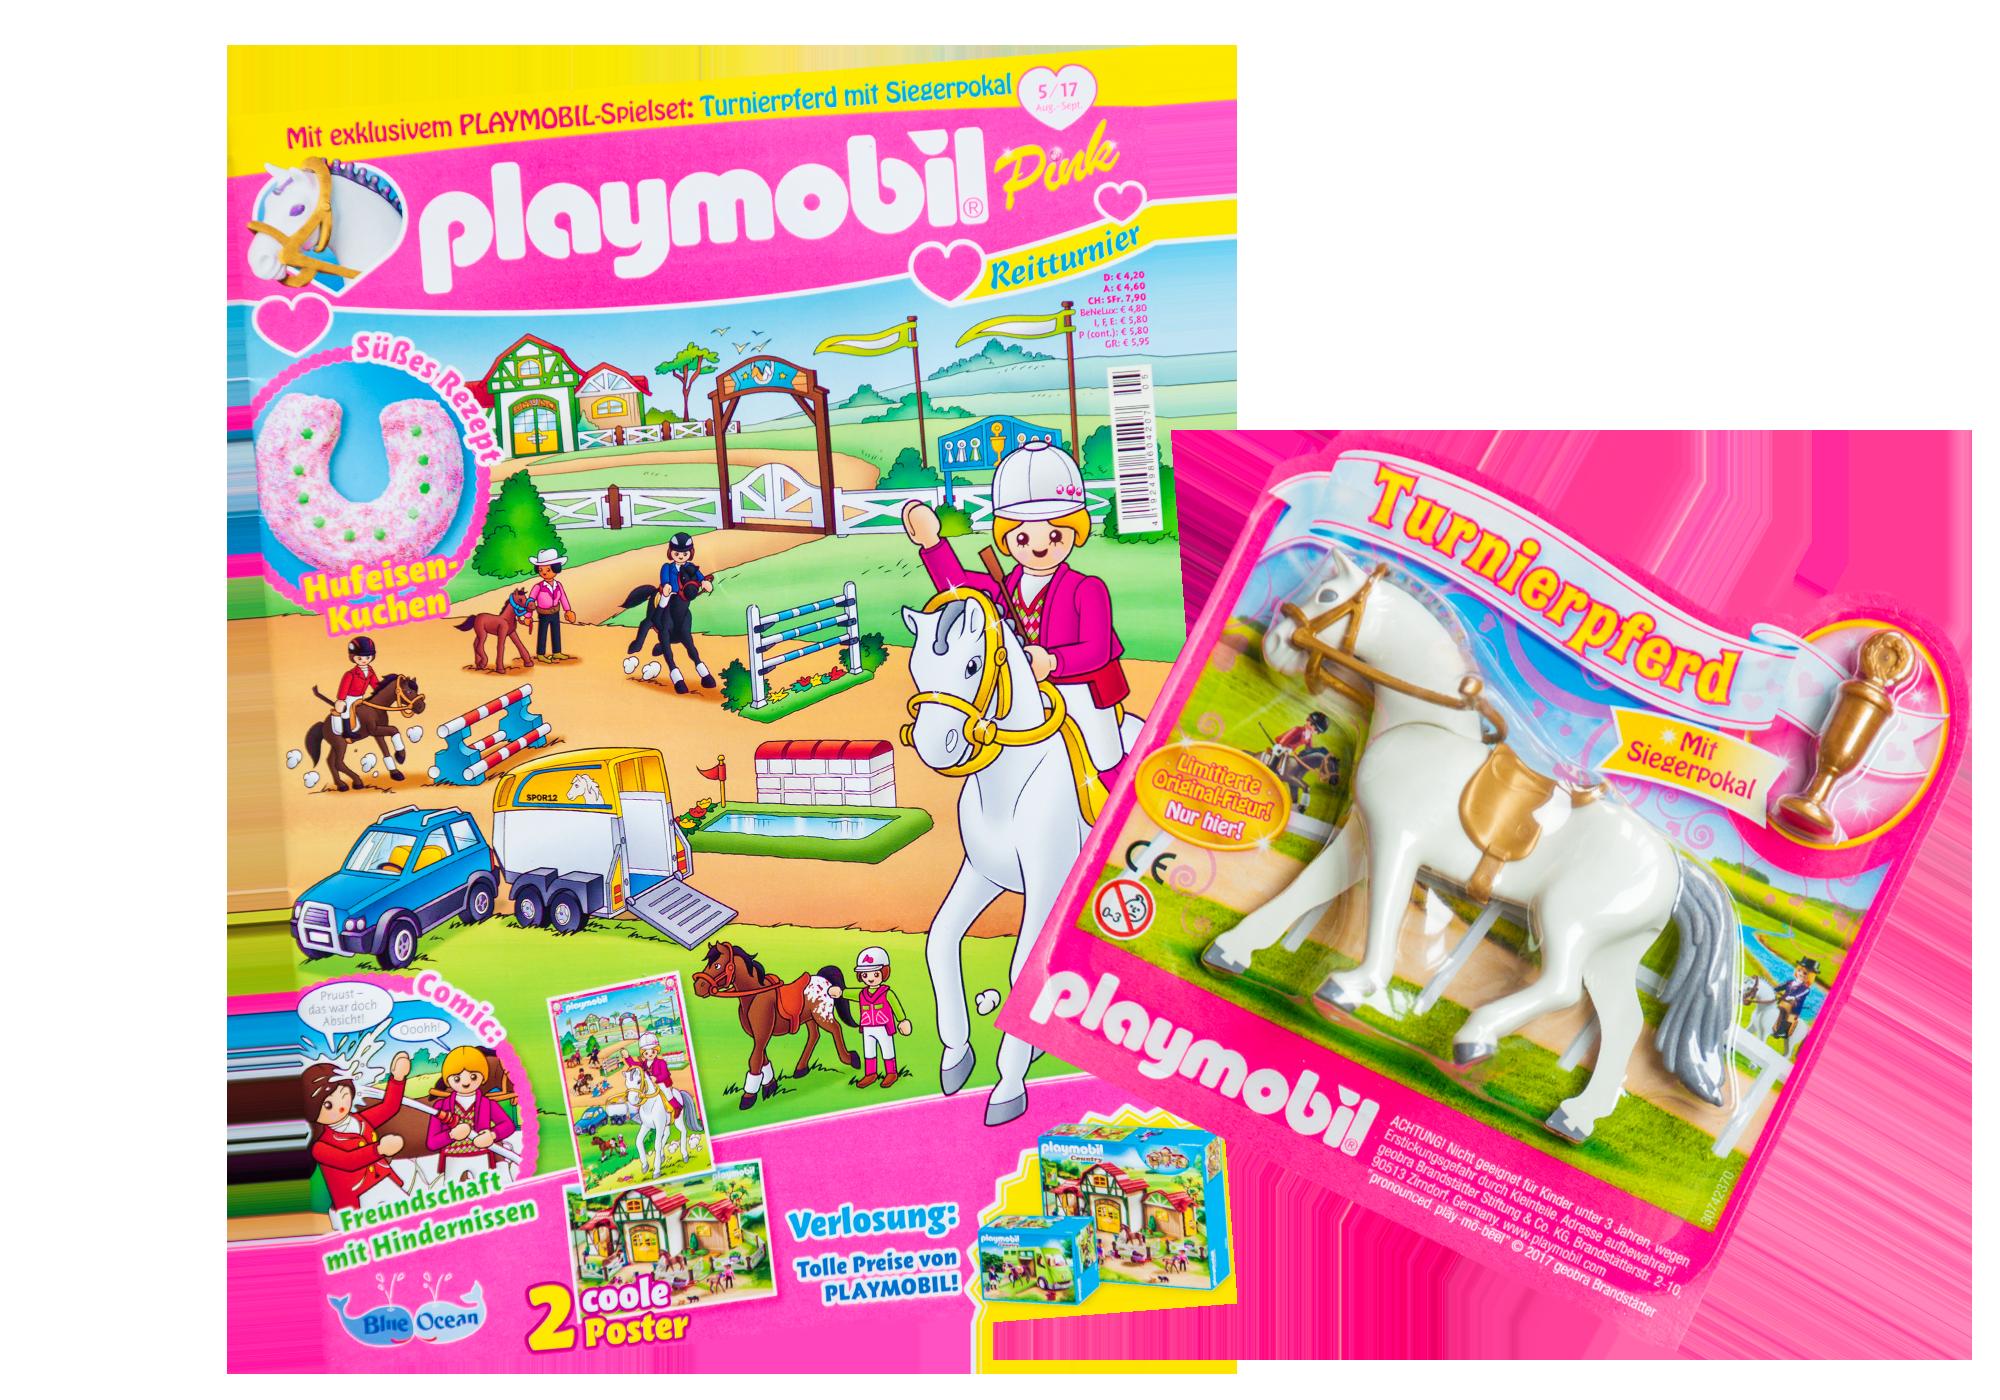 http://media.playmobil.com/i/playmobil/80594_product_detail/PLAYMOBIL-Magazin Pink 5/2017 (Heft 30)